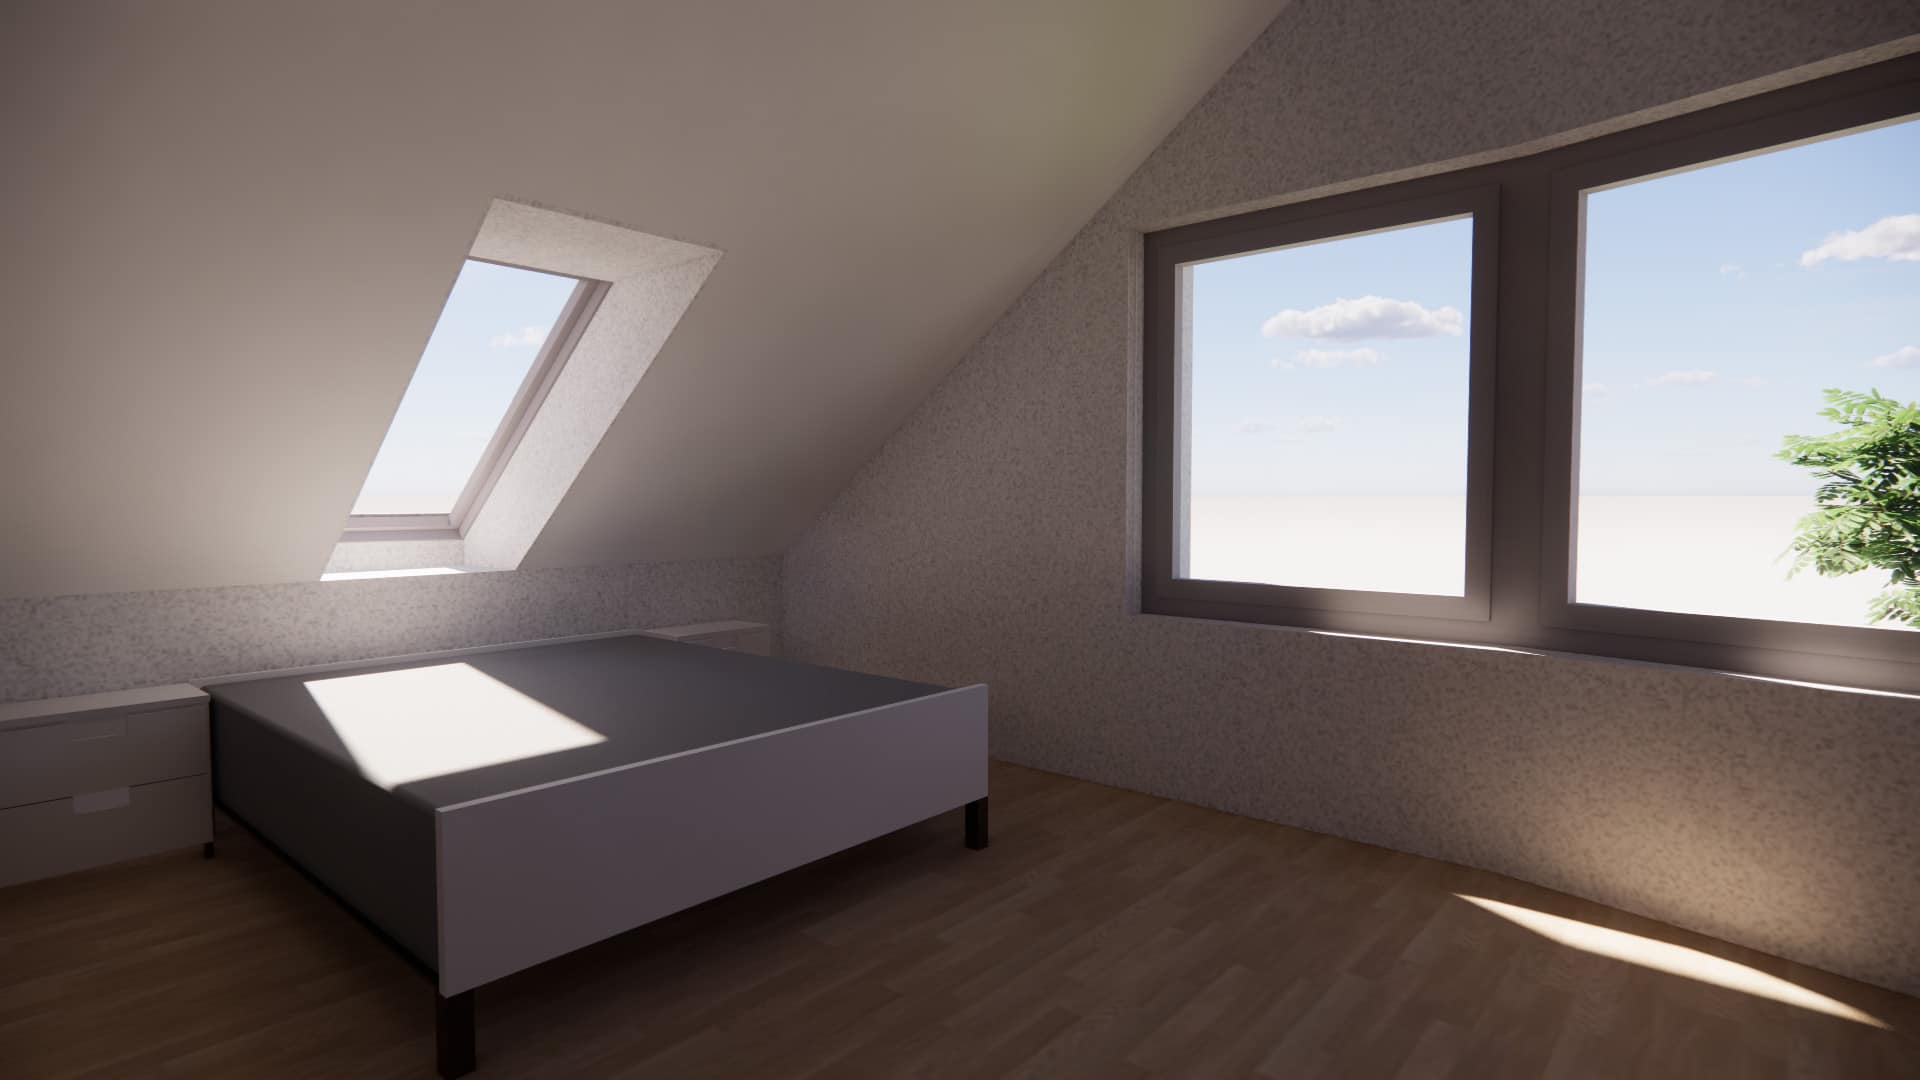 13-Zimmer 4 DG